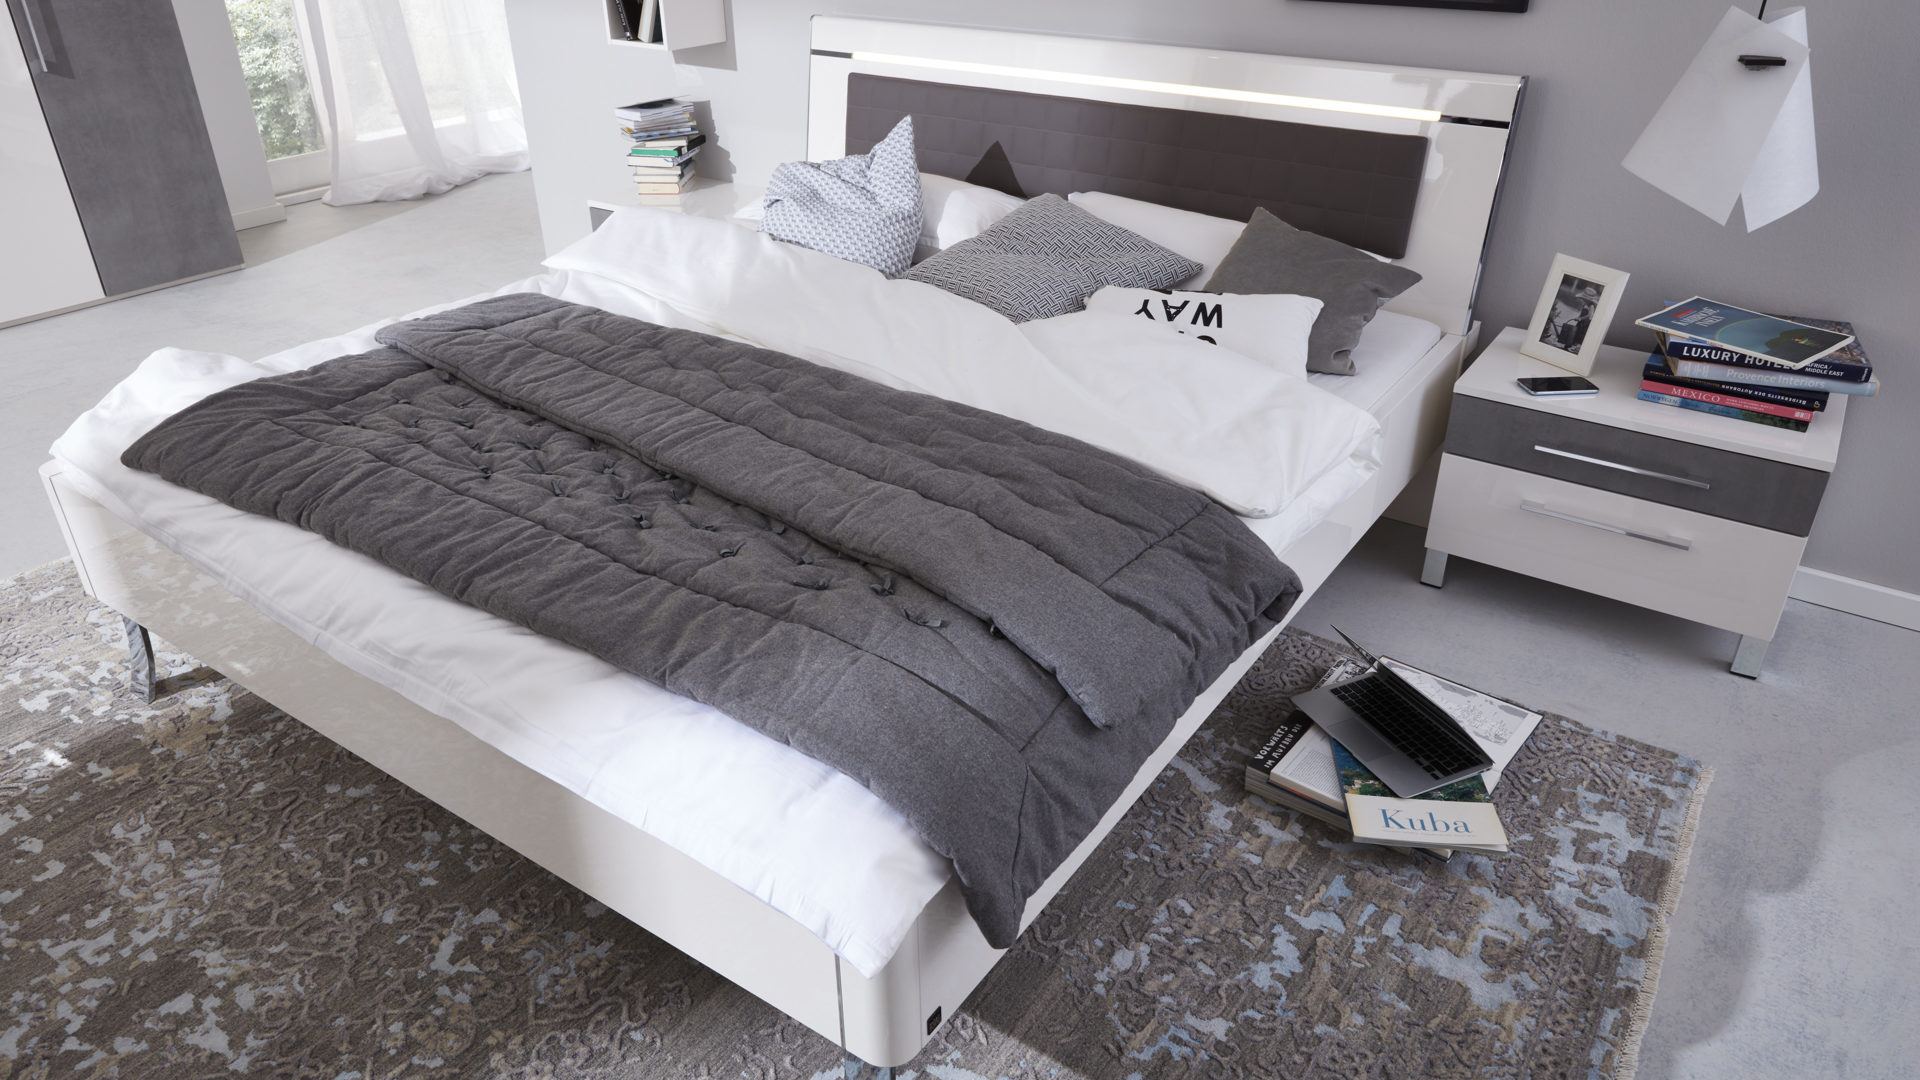 Möbel Boer Coesfeld | Markenshops | Schlafzimmer | Interliving ...